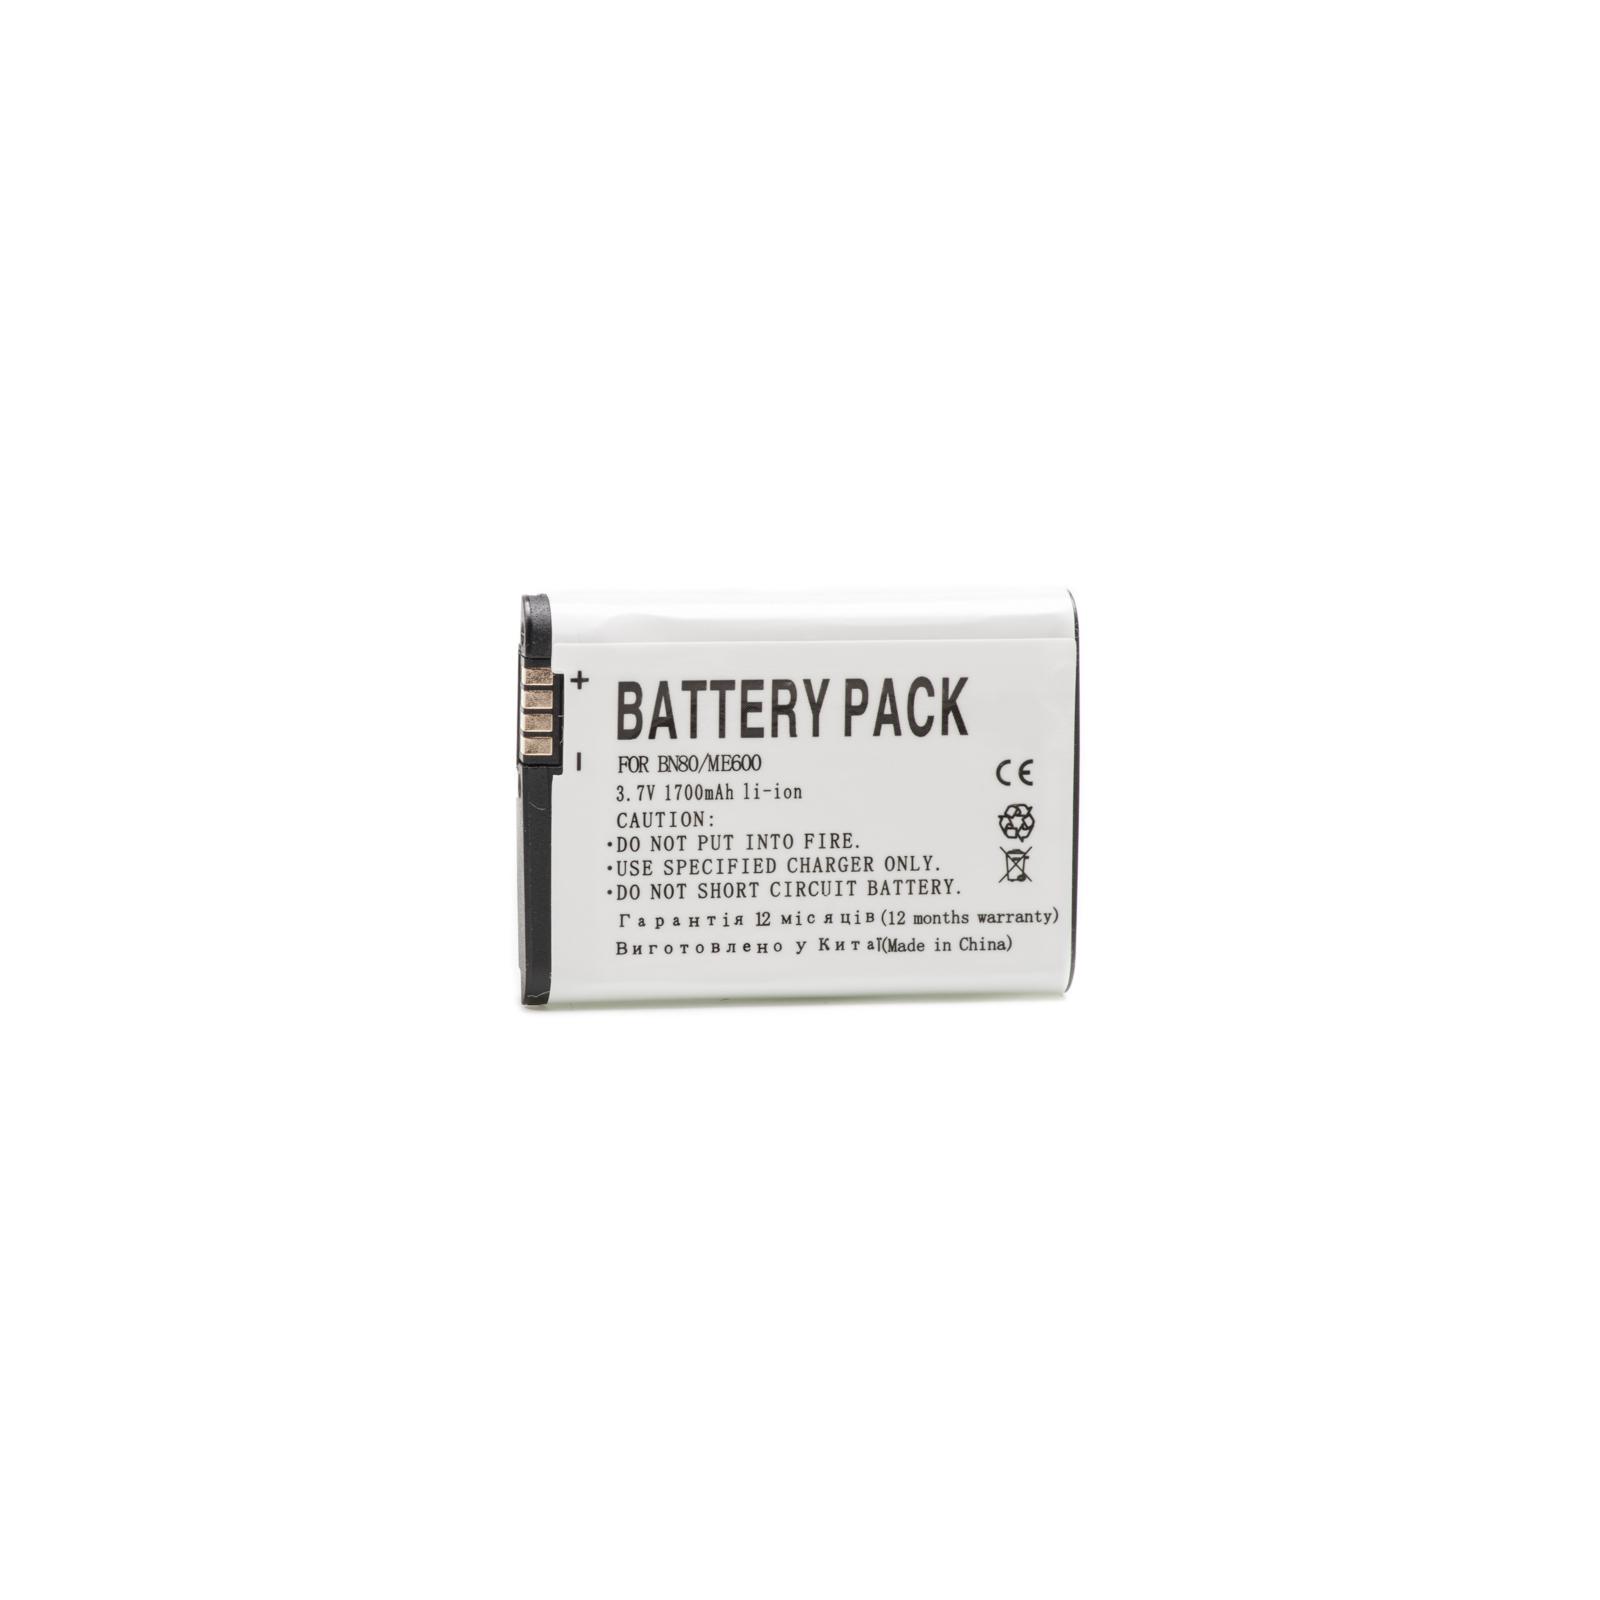 Аккумуляторная батарея PowerPlant MOTOROLA ME600/MT720/XT806/MT810LX/MB300/MT716/XT806LX (DV00DV6179)